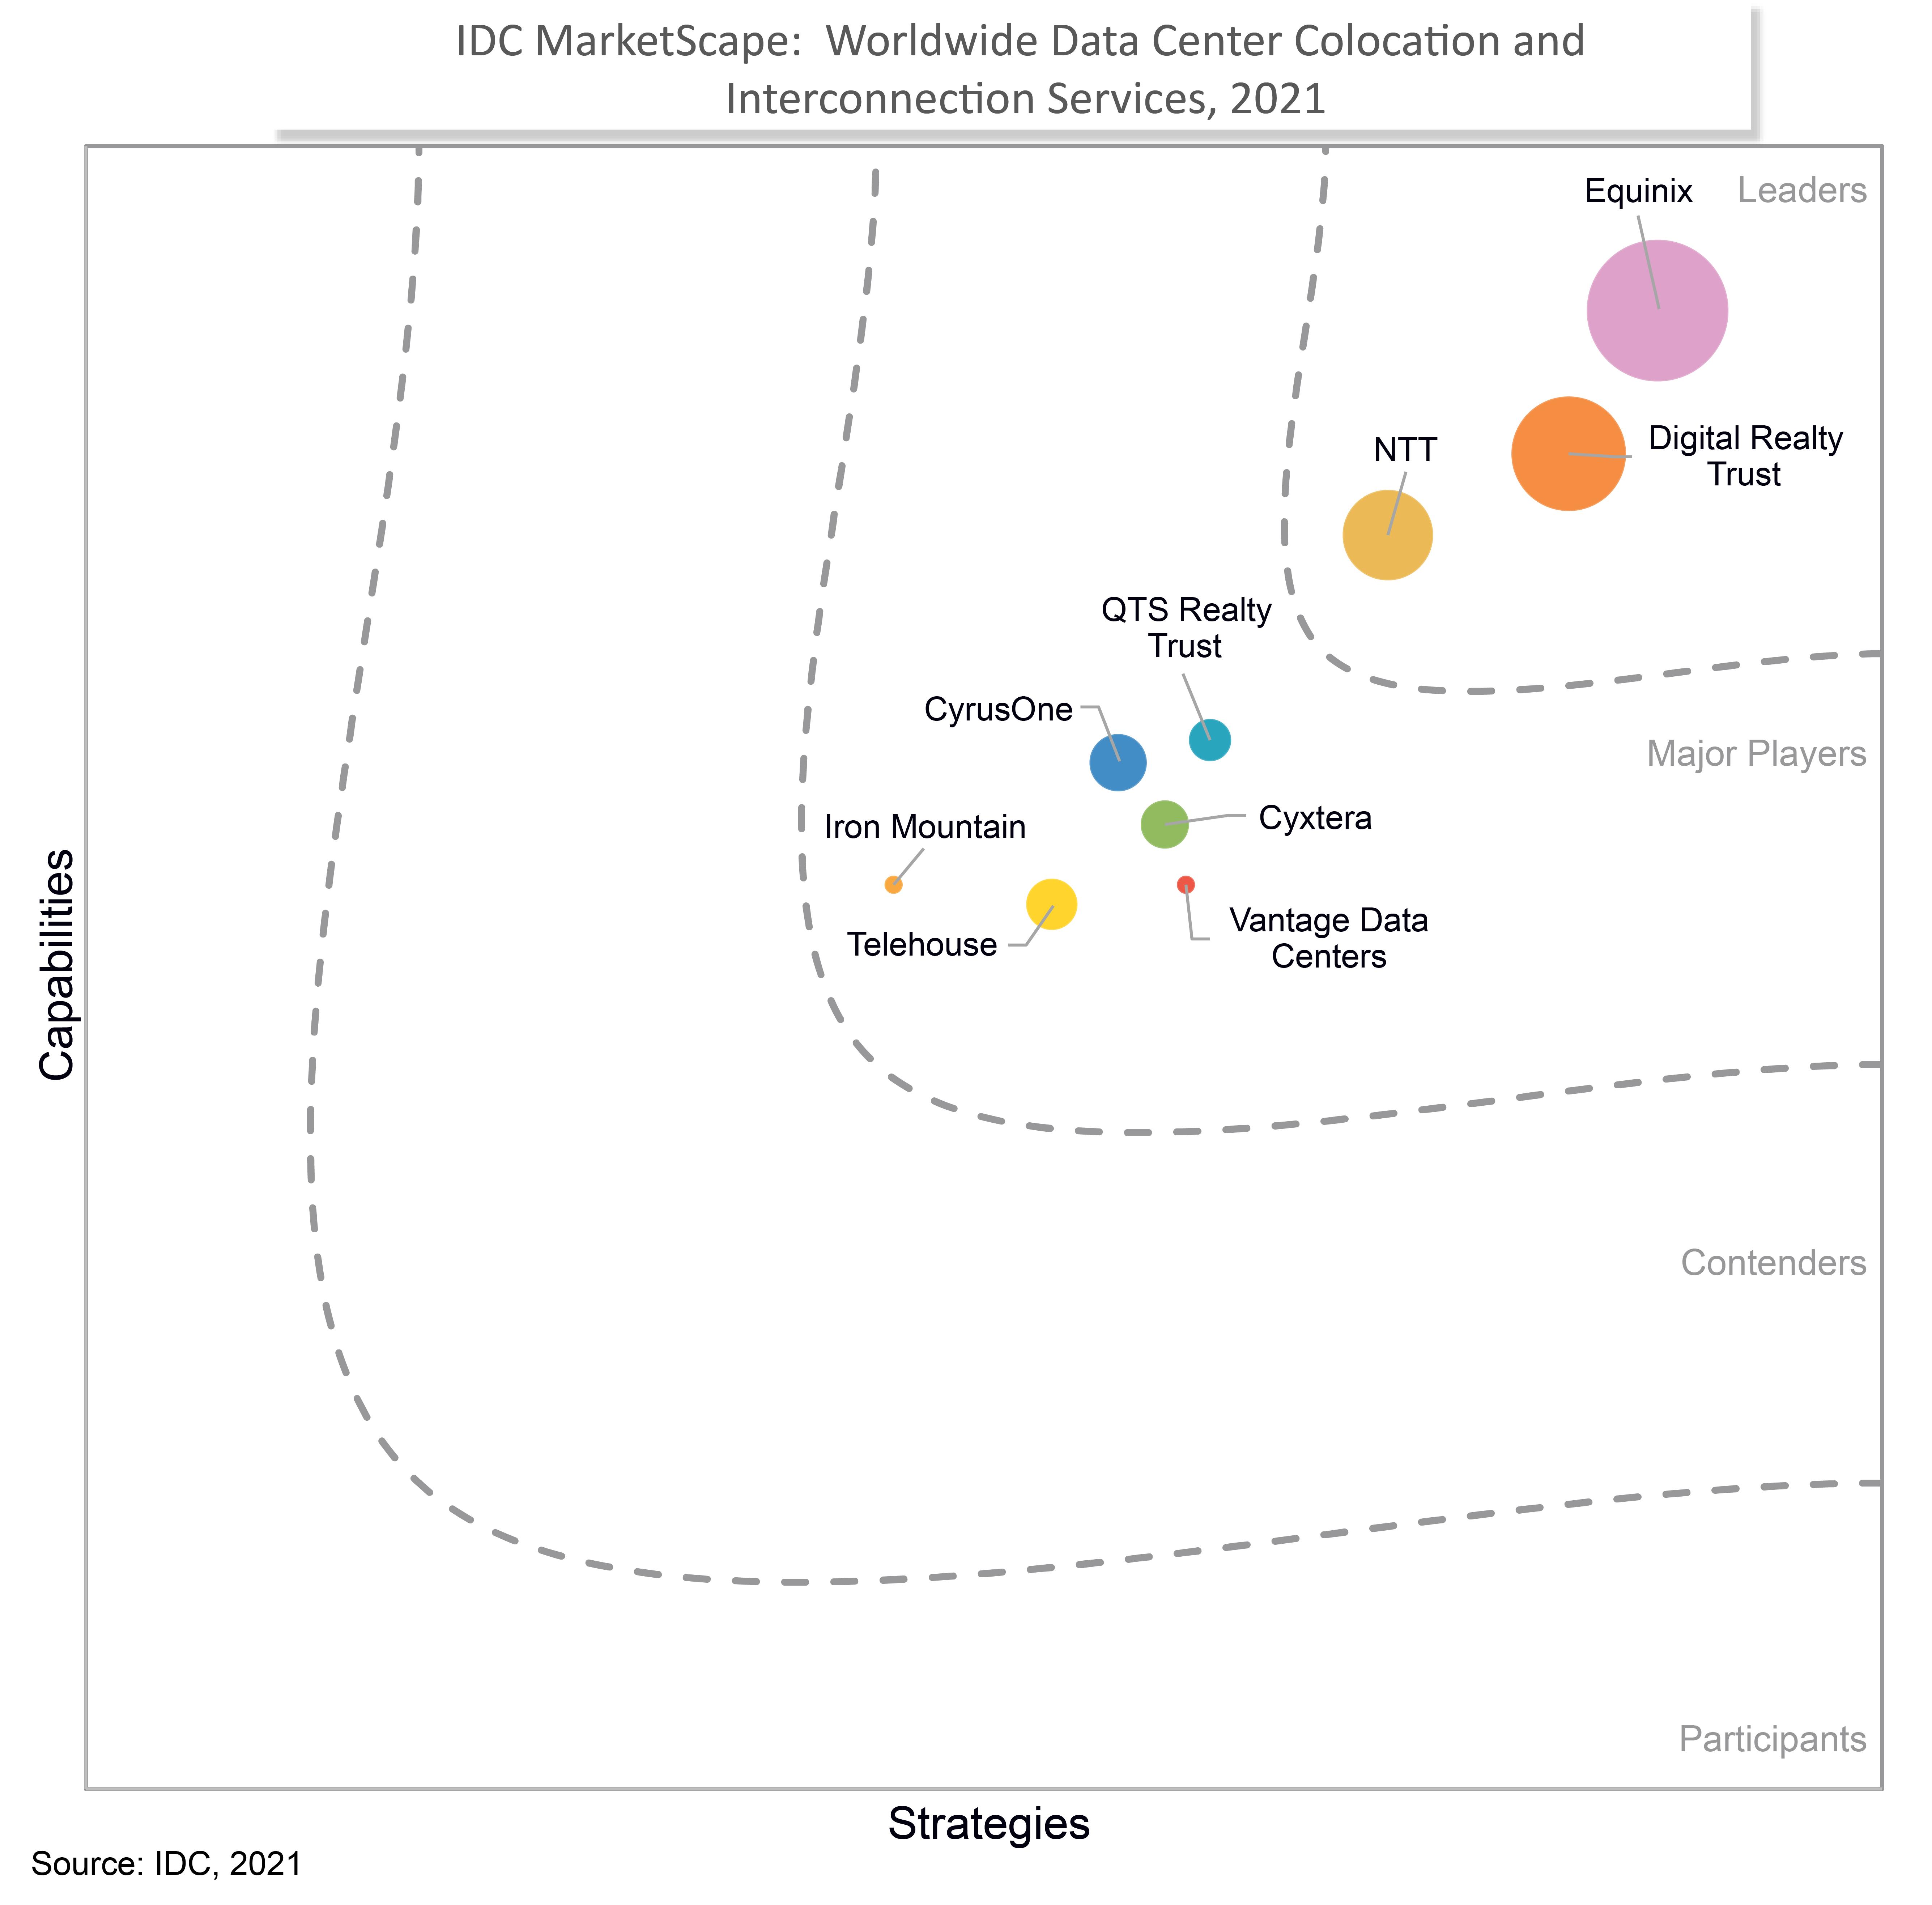 Digital Realty as leader in IDC marketscape